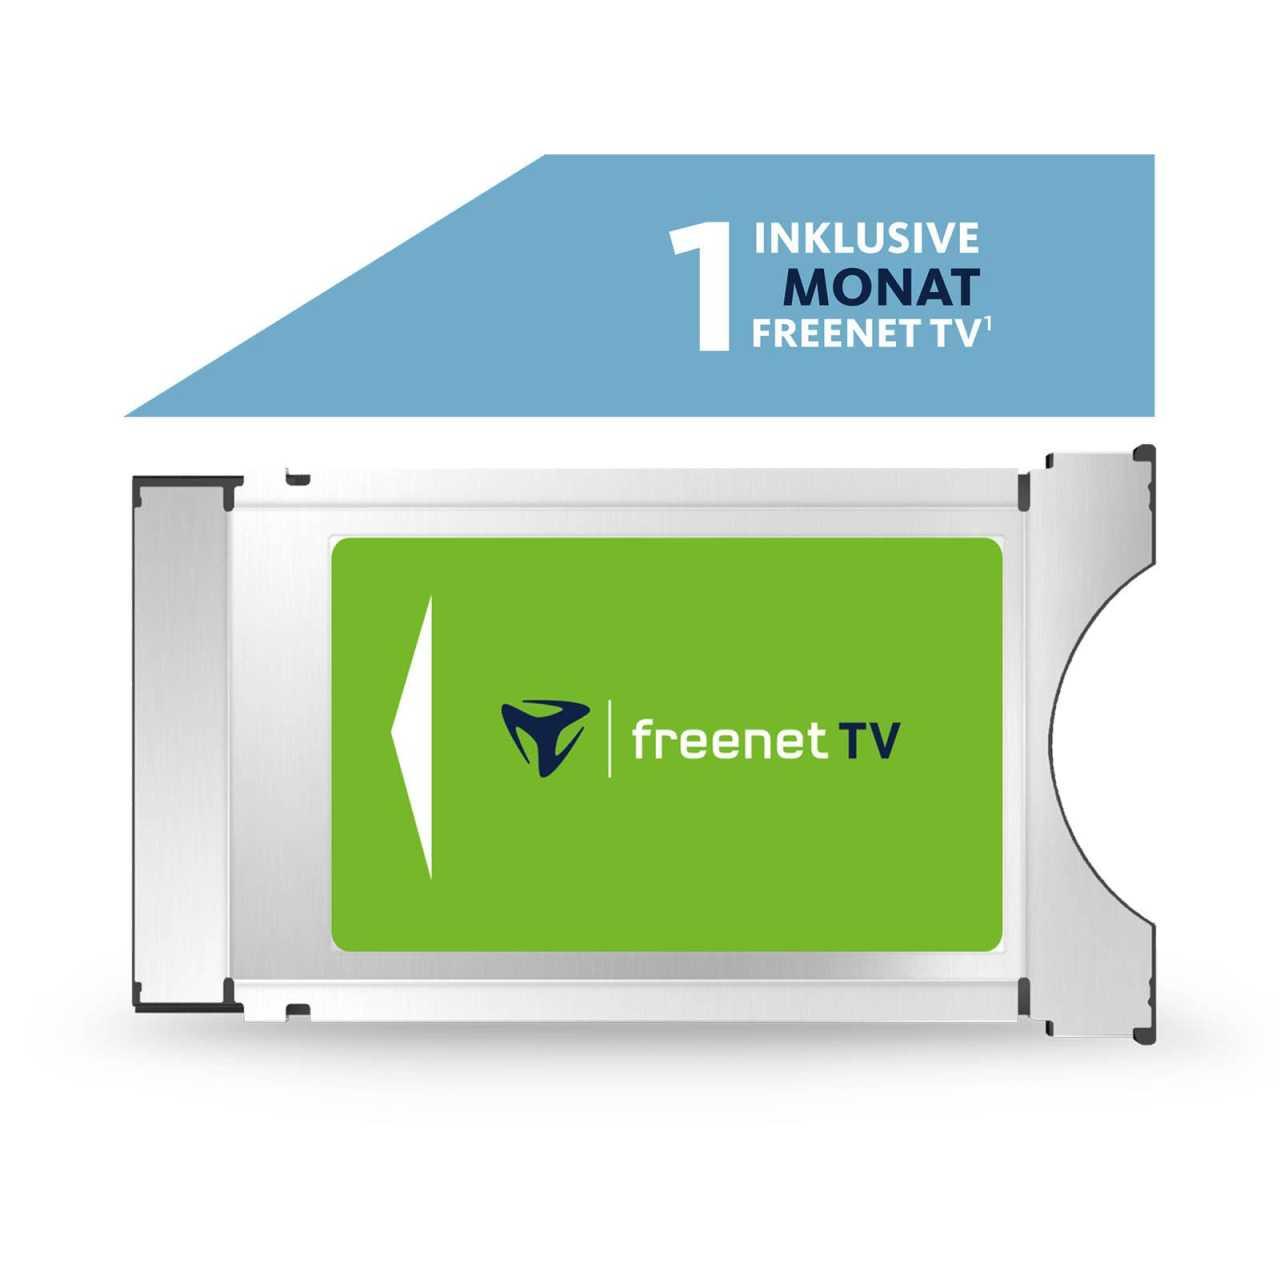 Freenet TV HD CI+ Modul für DVB-T2 HD inkl. 1 Monat Freenet TV Gratis ABOFRETV5